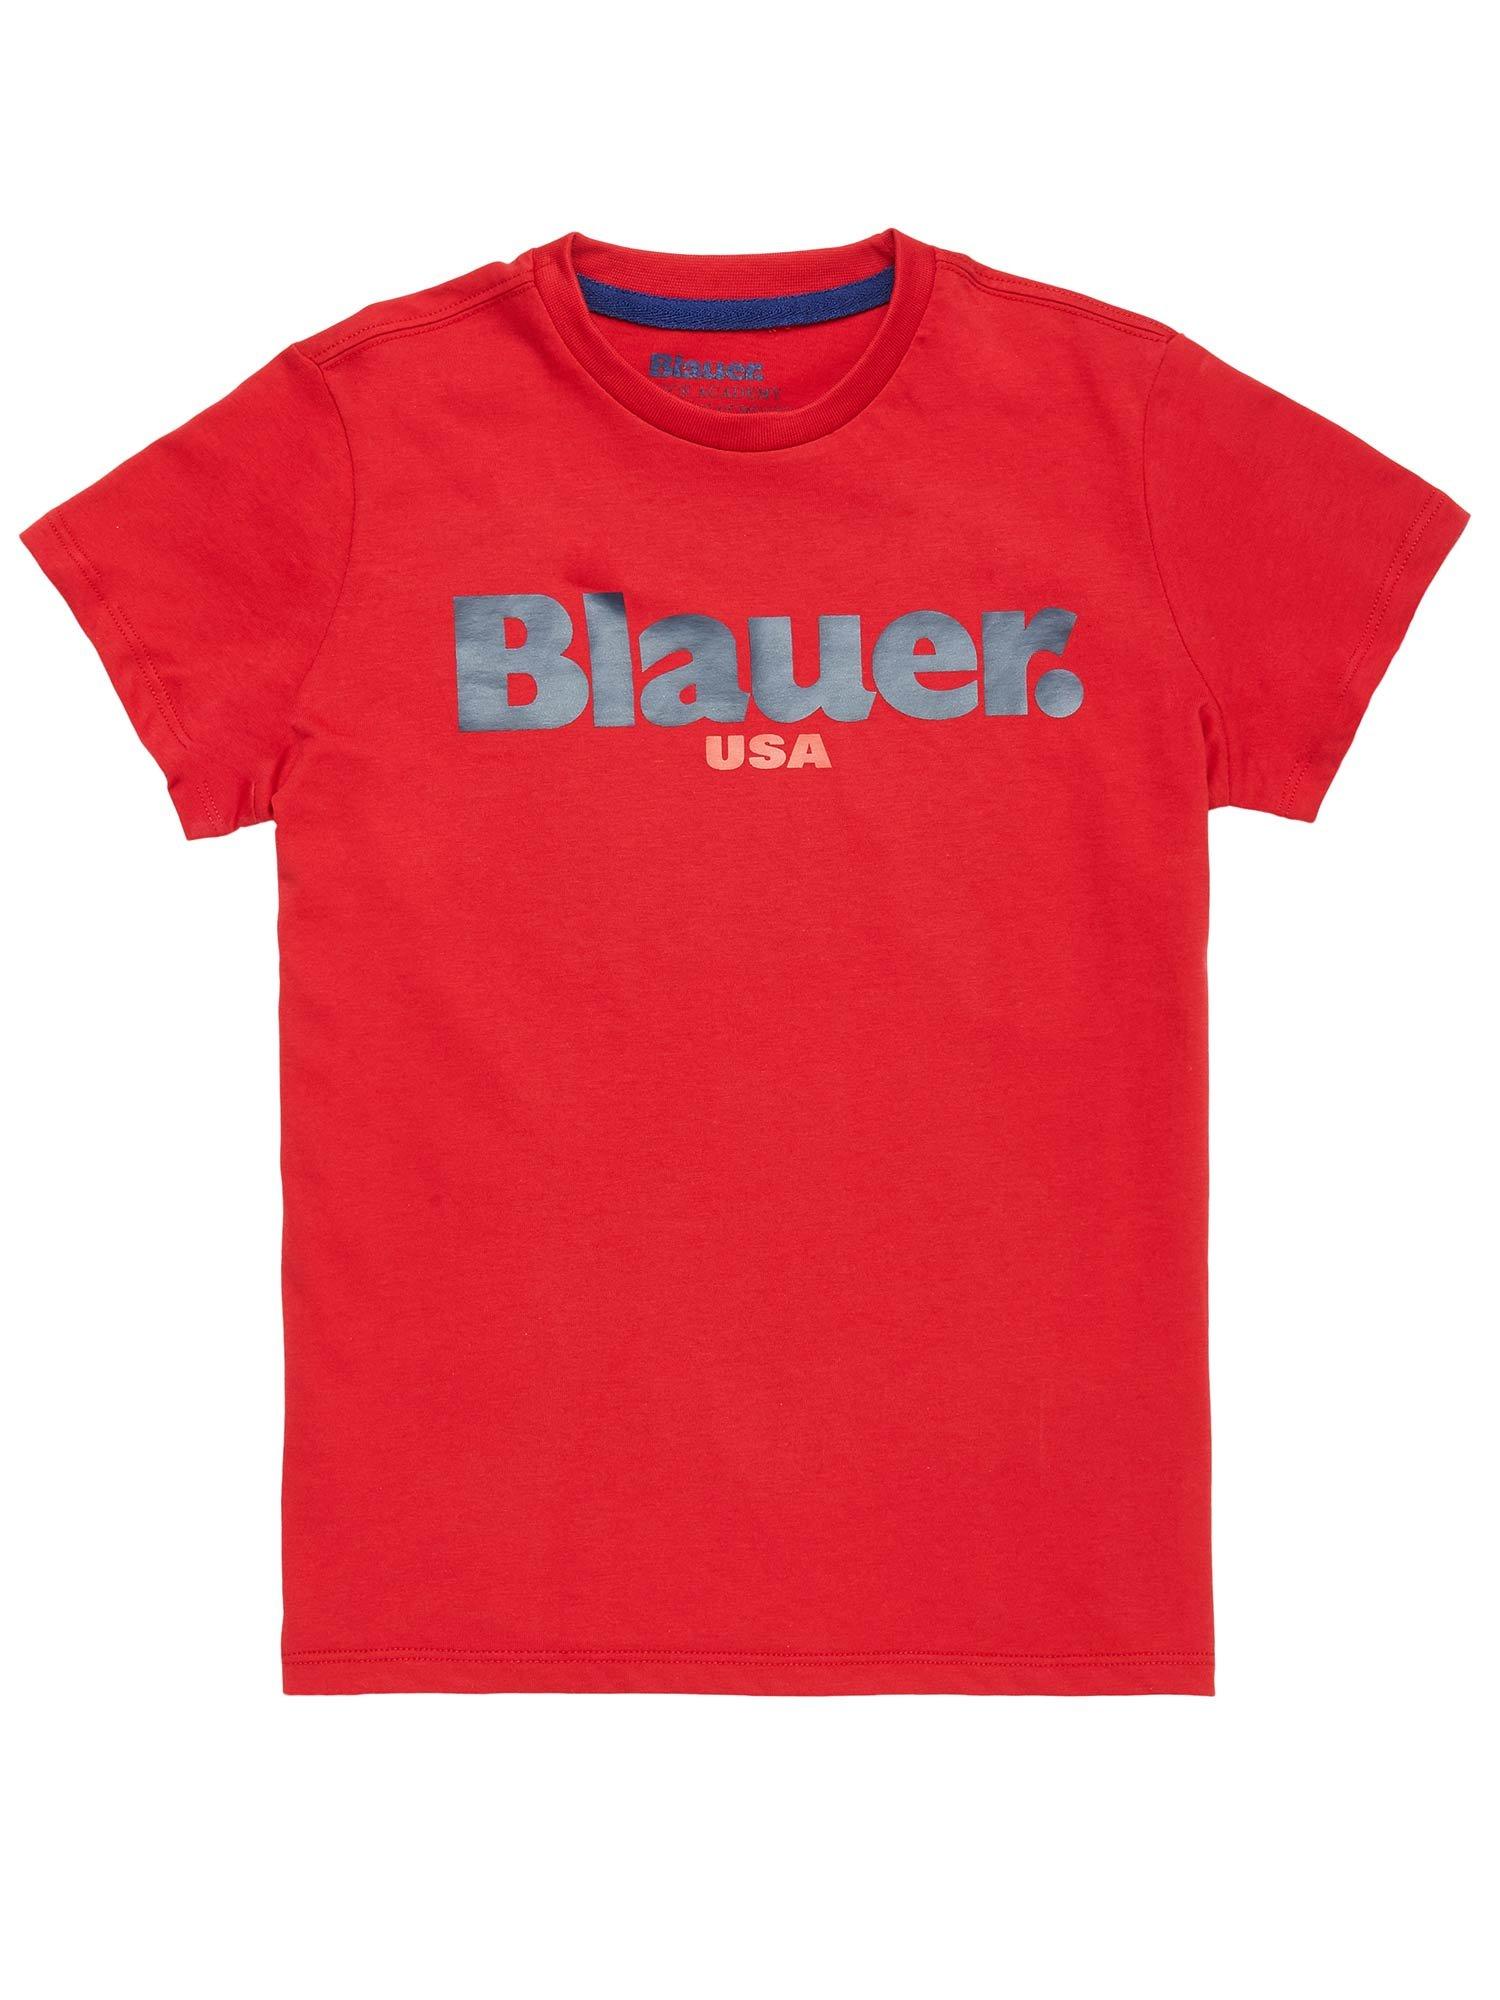 KID'S BLAUER USA T-SHIRT - Blauer